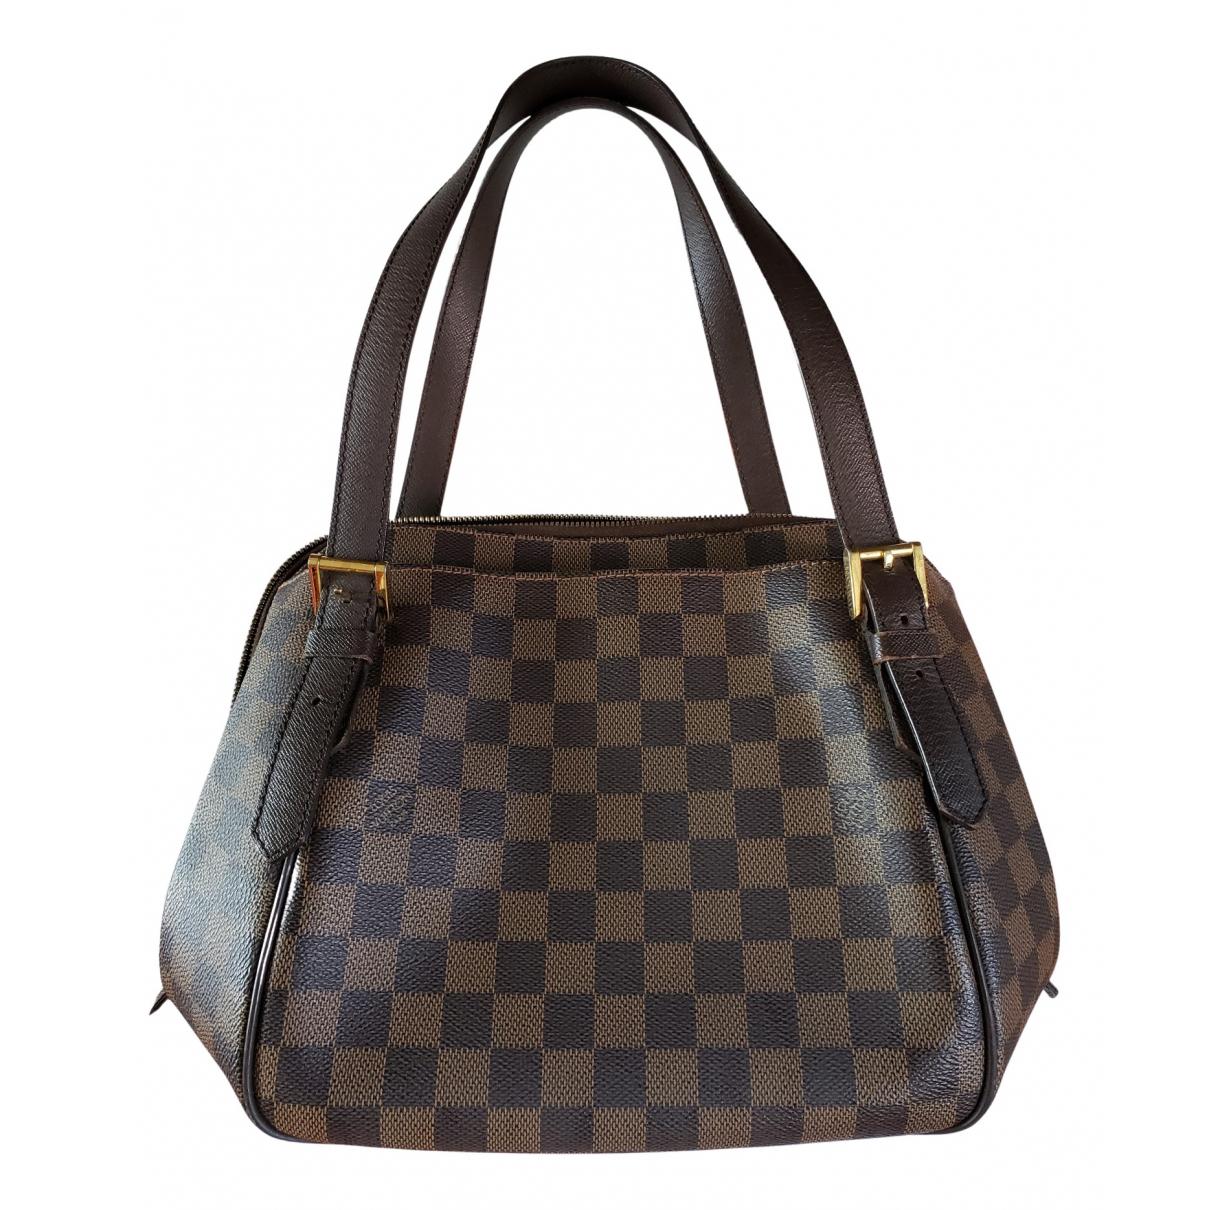 Louis Vuitton Rivington Handtasche in  Braun Leinen